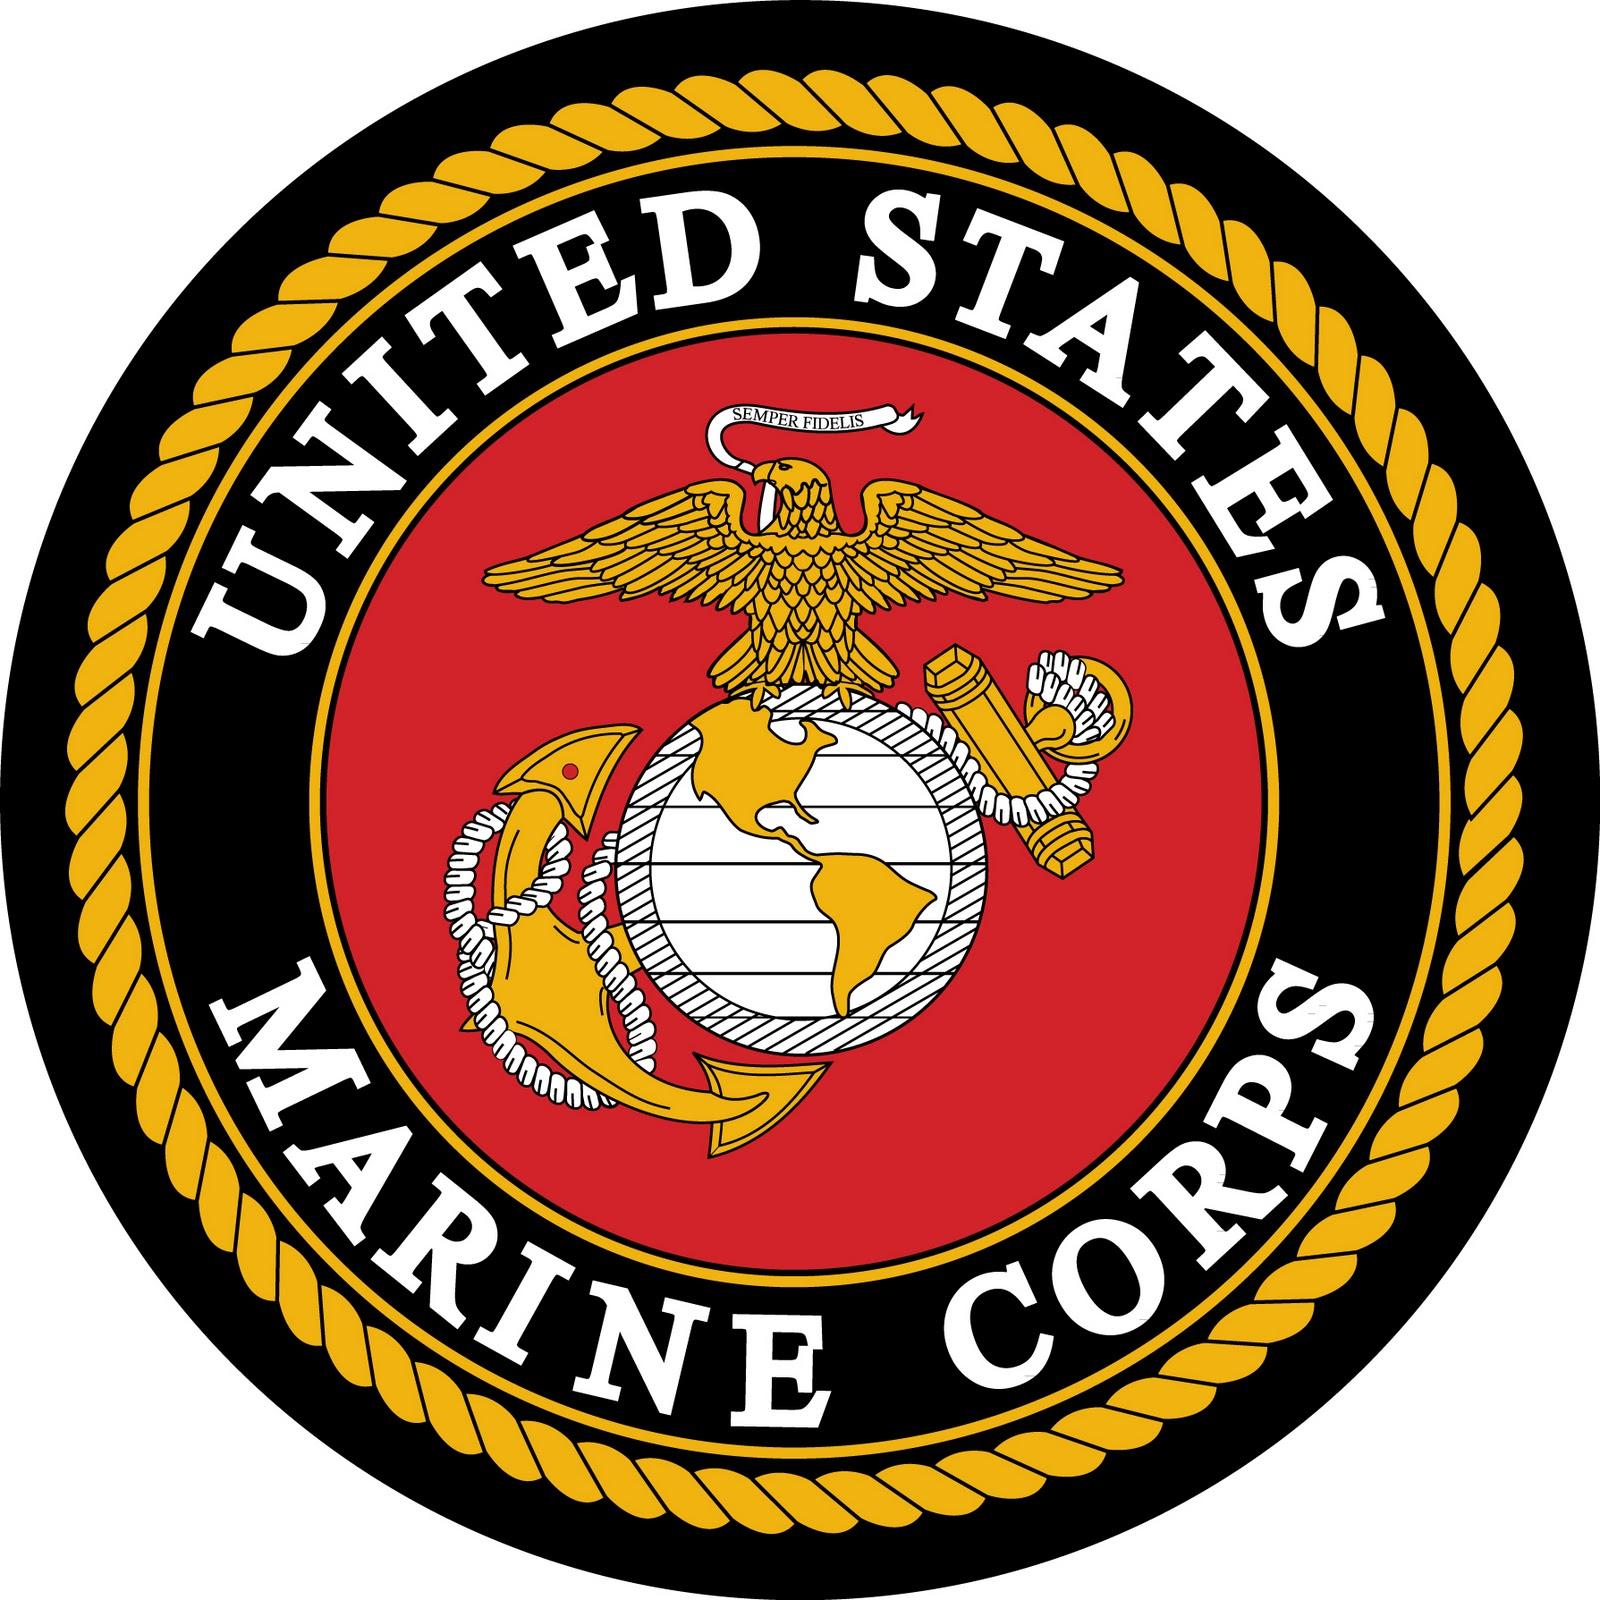 United States Marine Corps Clipart.